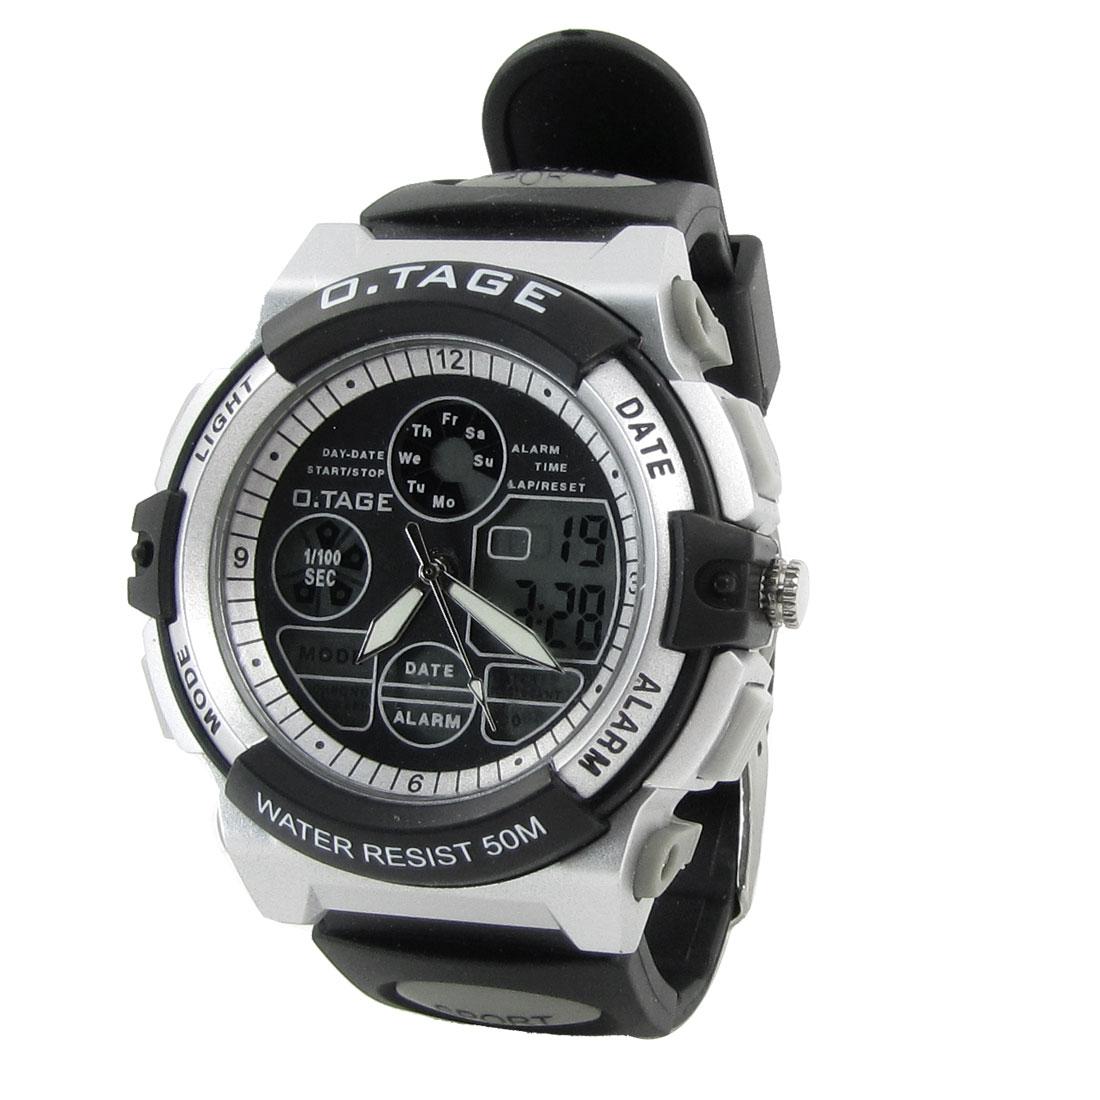 Black Adjusting Band Stopwatch Alarm Digital Sports Watch Wristwatch for Man